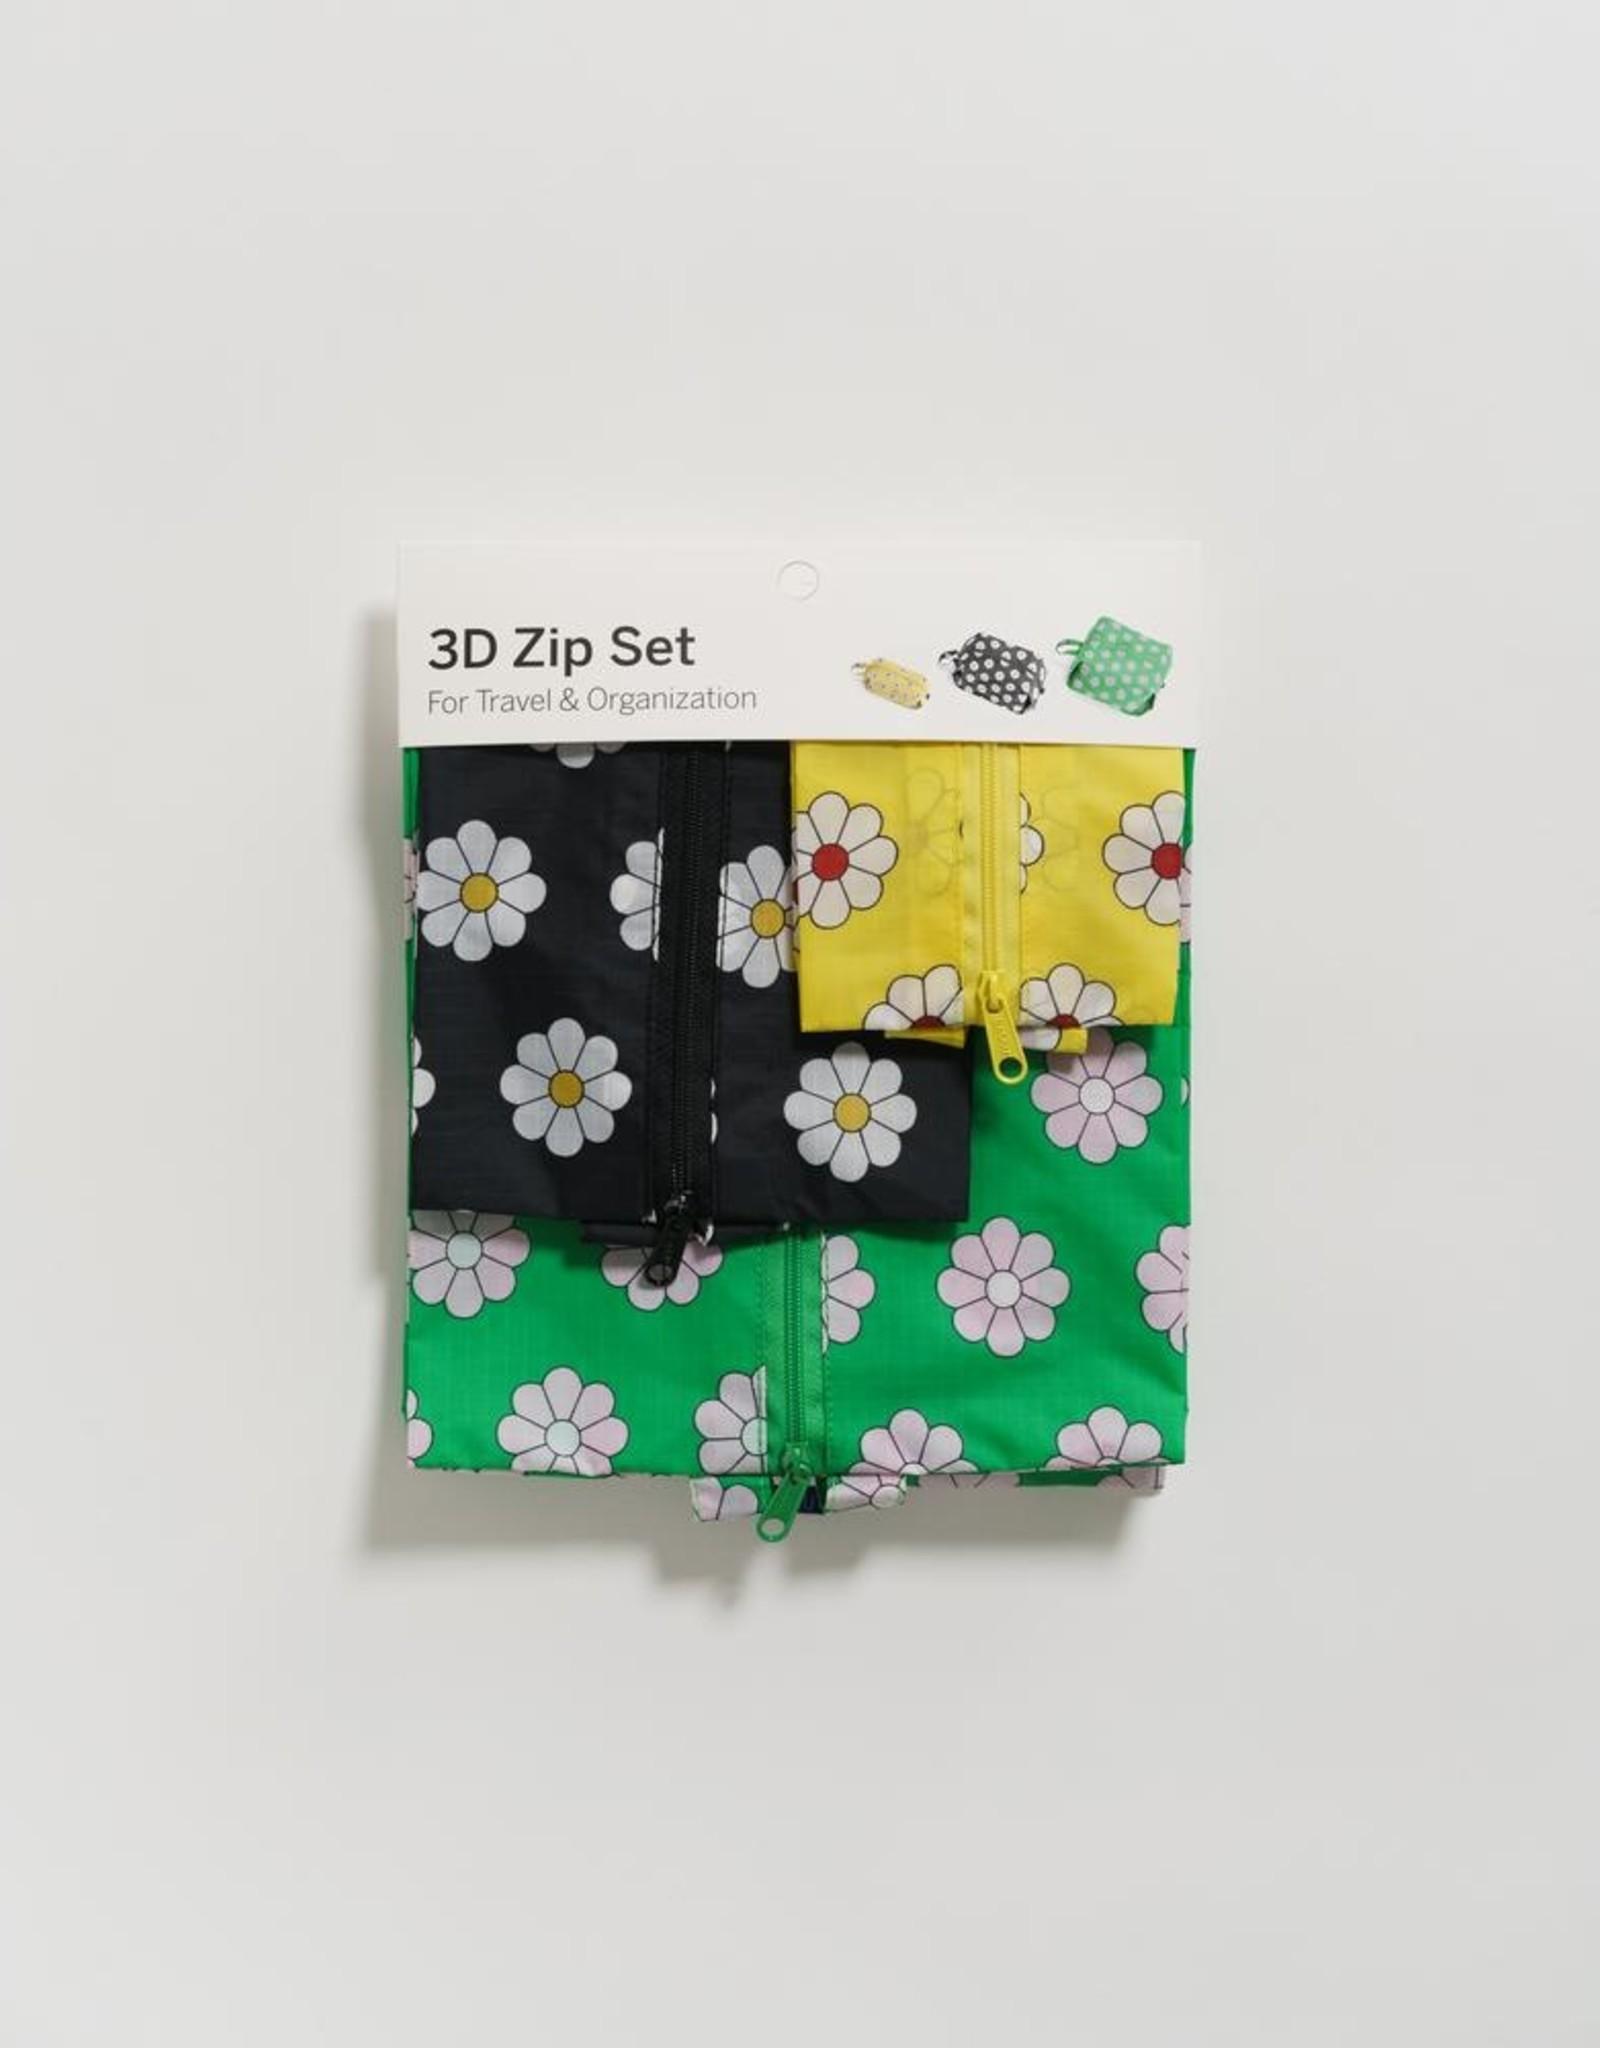 Baggu 3D Zip Set